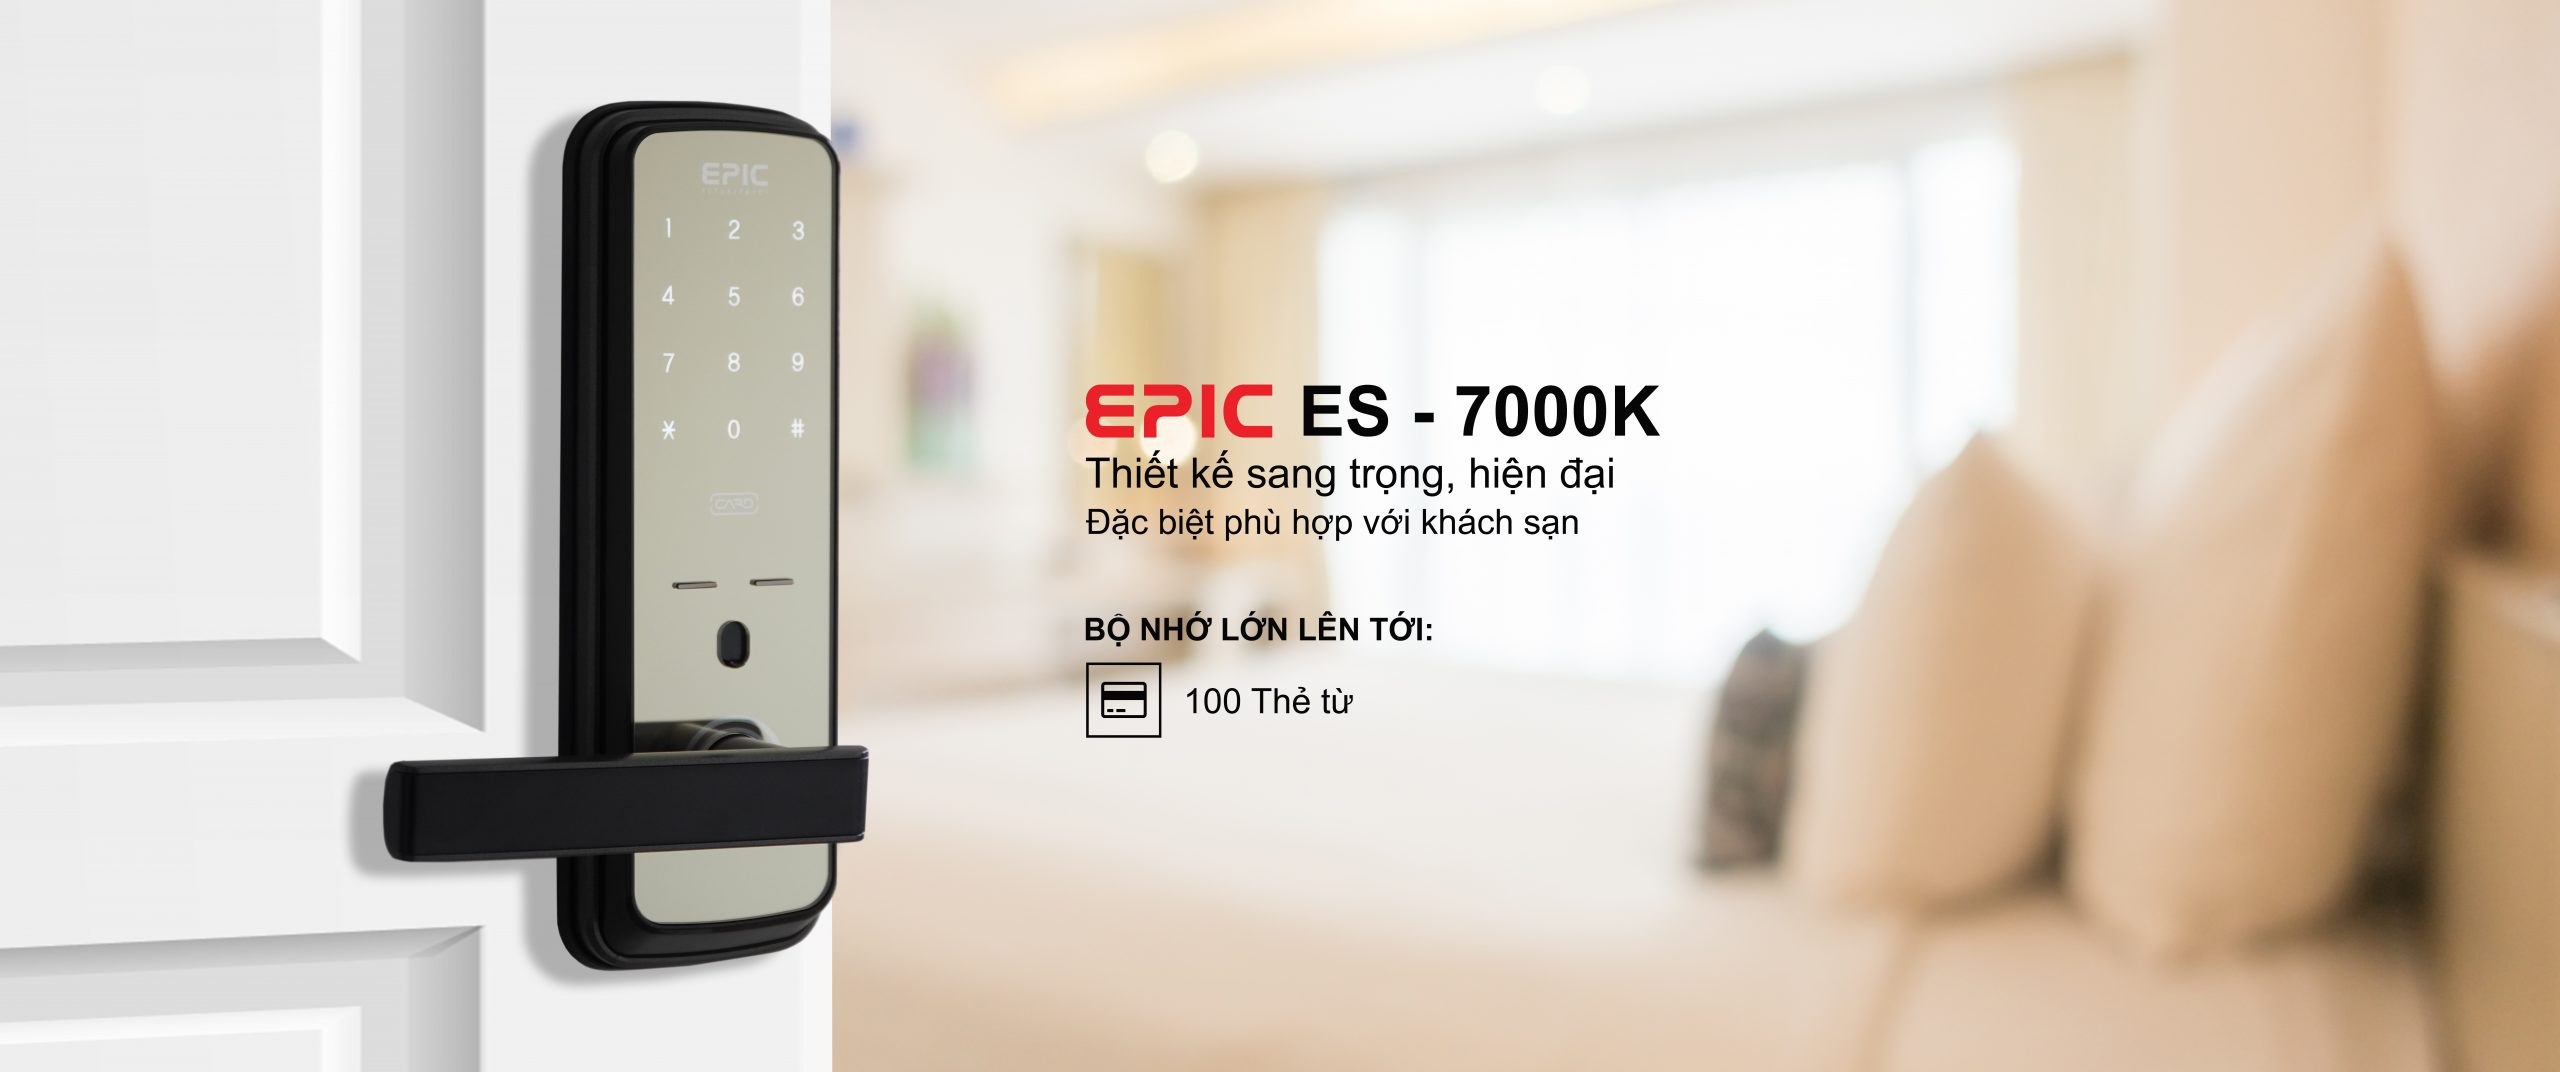 khoa-cua-dien-tu-epic-es-7000